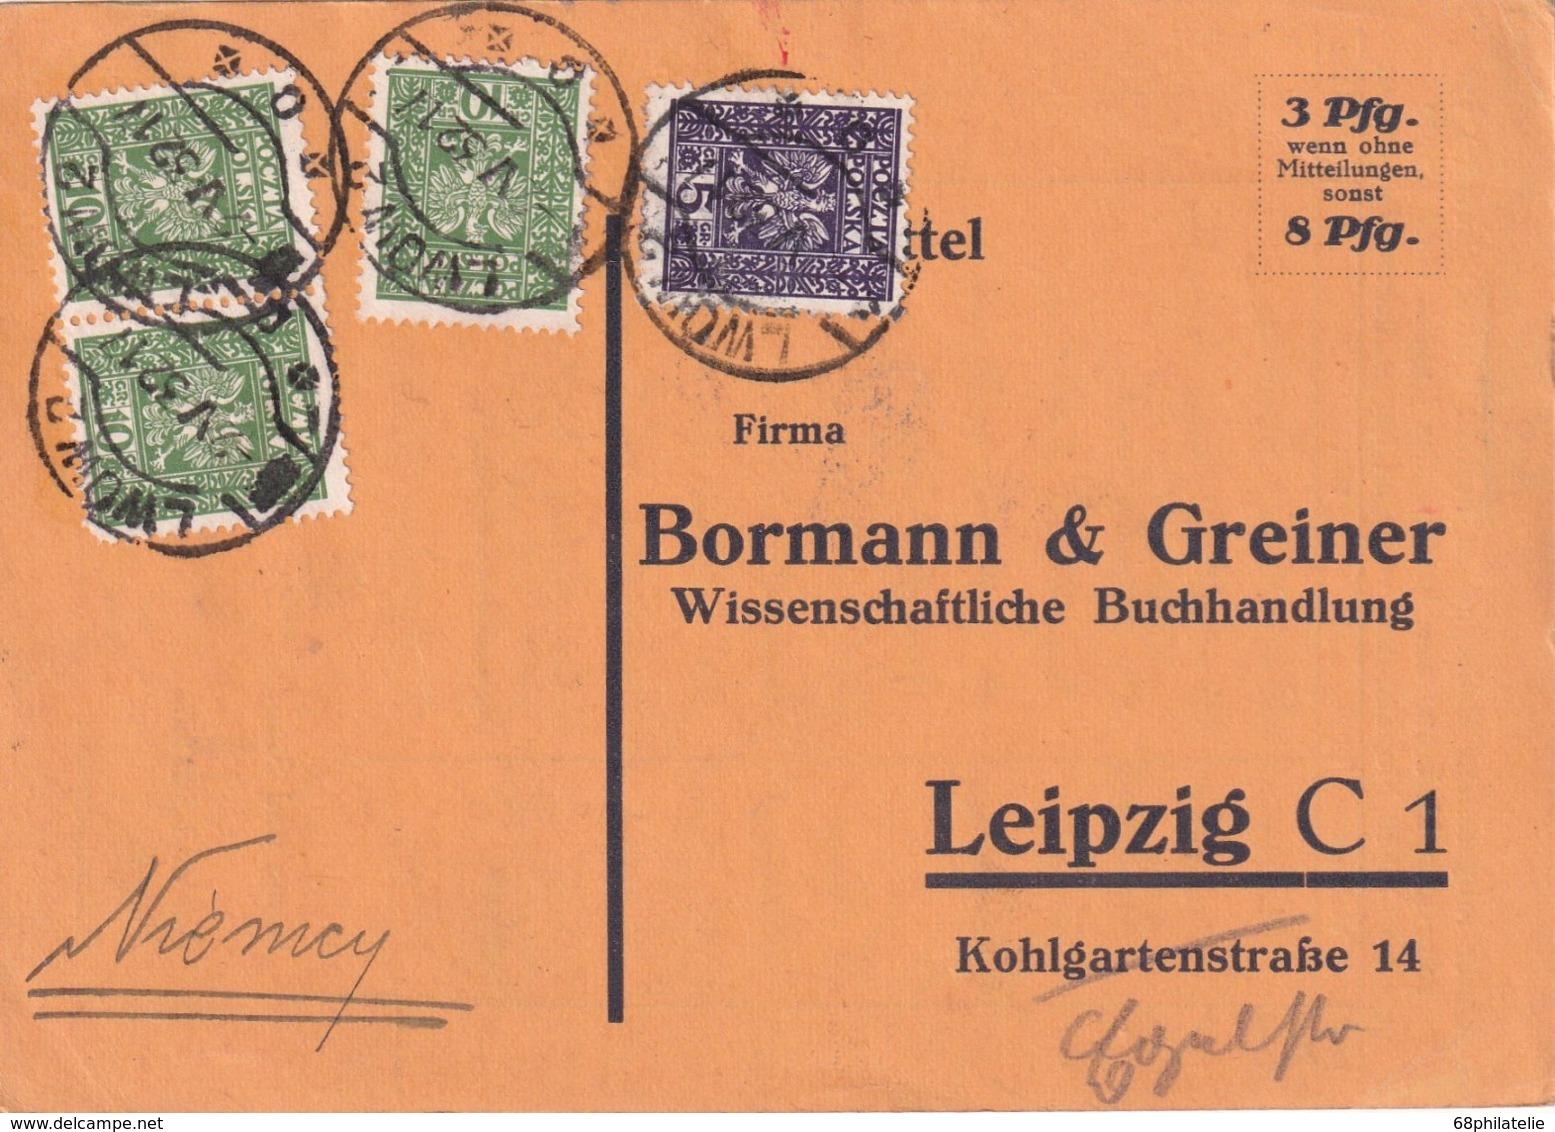 POLOGNE 1932 CARTE DE LWOW - 1919-1939 Republic